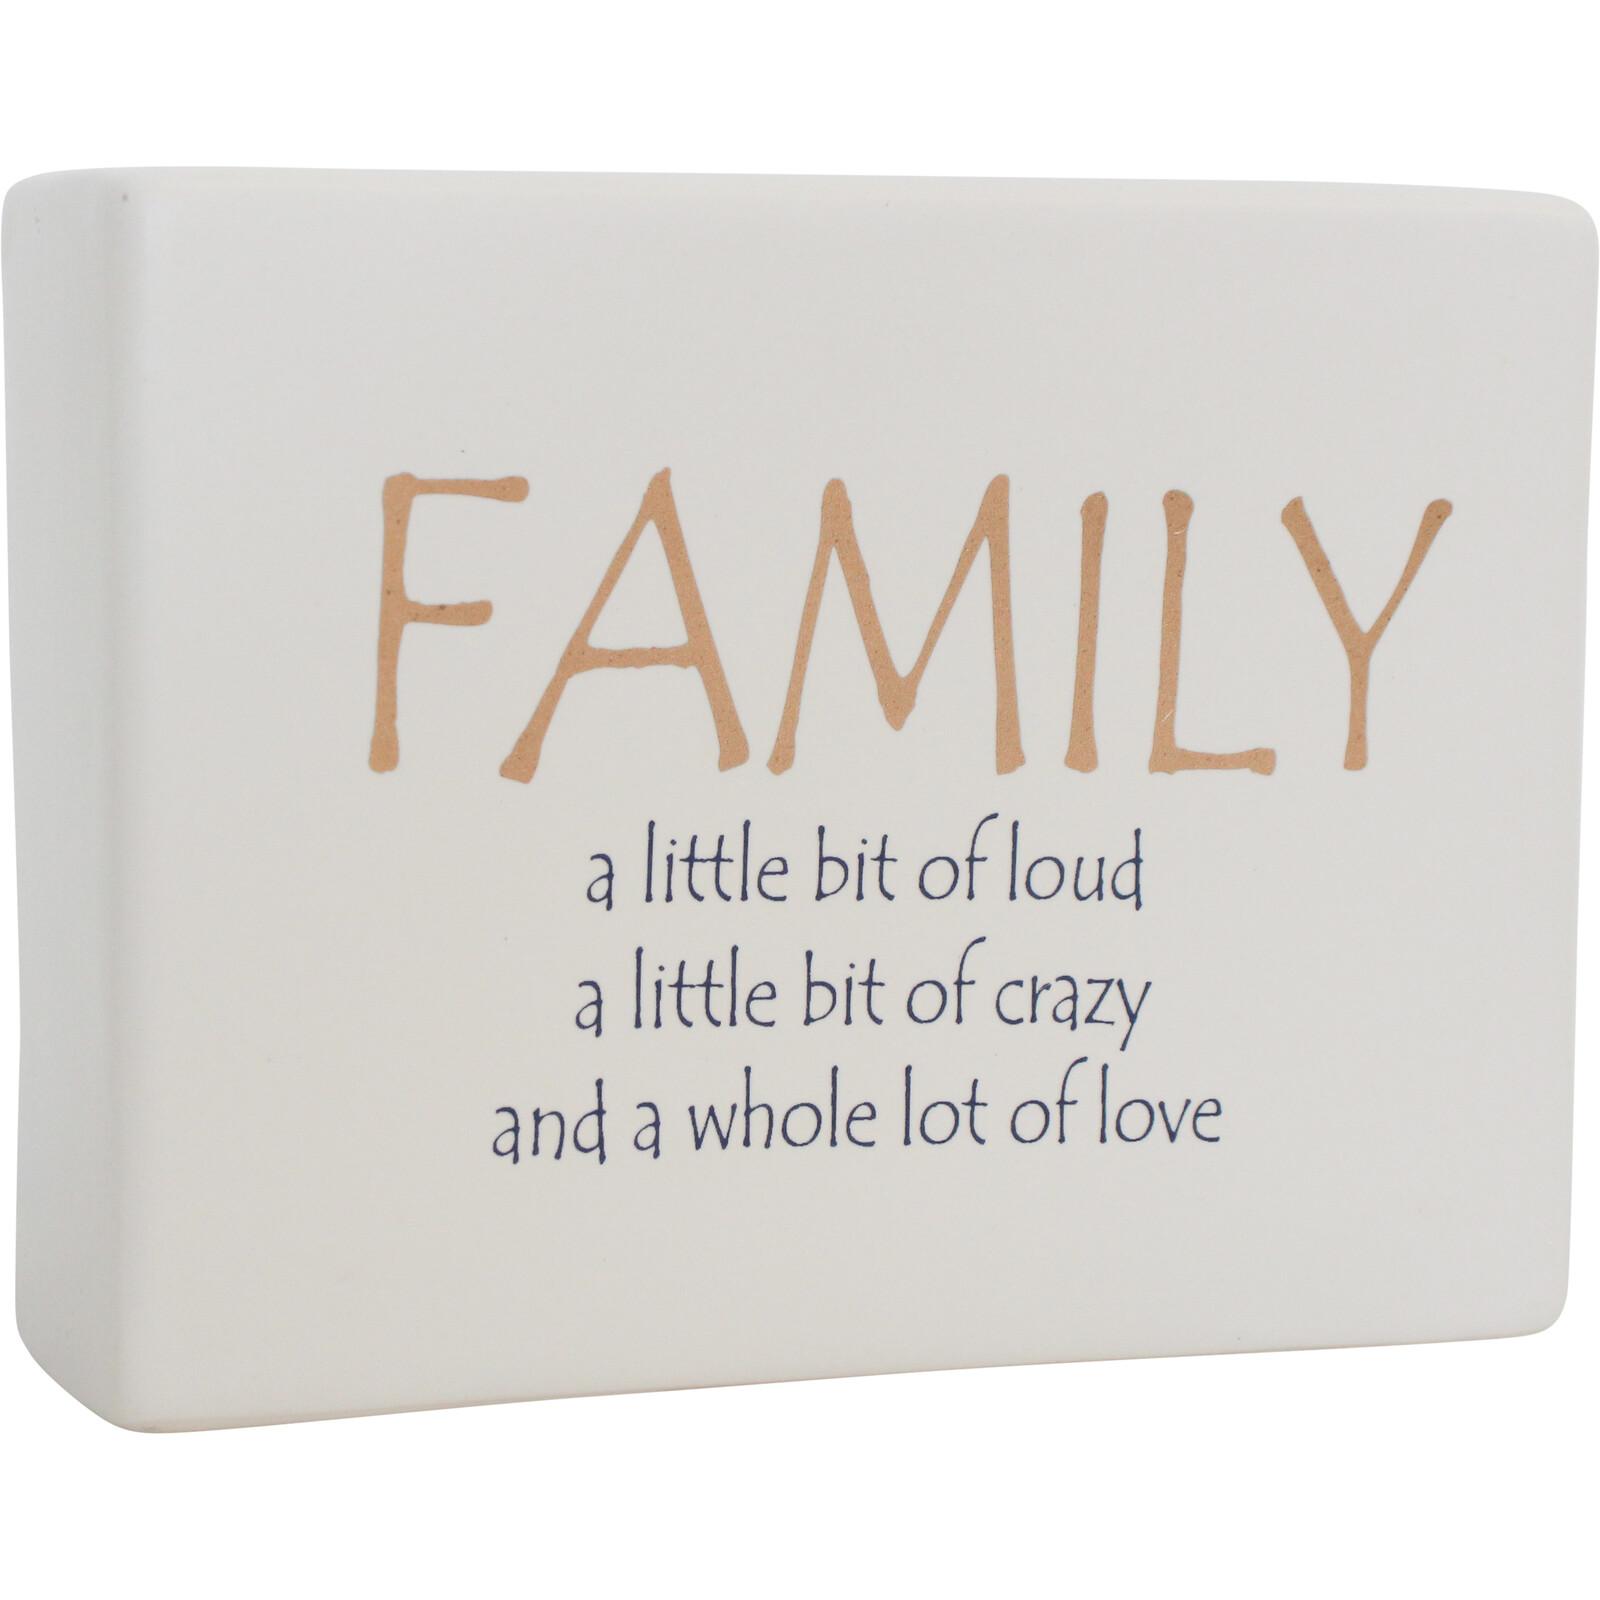 Ceramic Sign Family A Bit